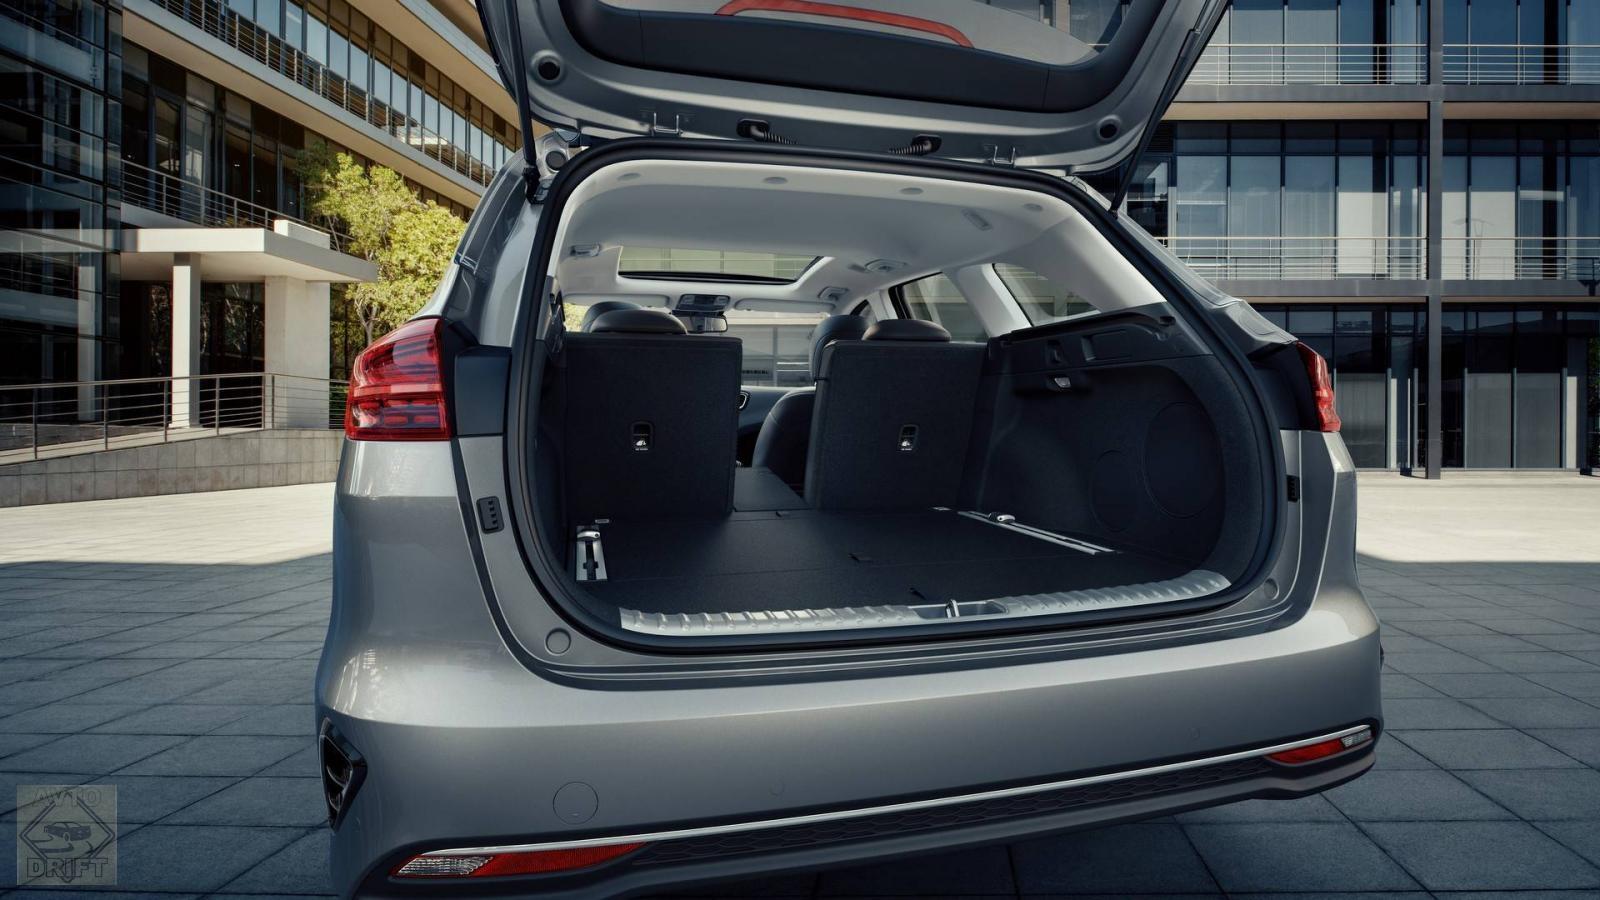 2018 kia ceed sportswagon 2 - Kia представила в Женеве Ceed Sportswagon третьего поколения